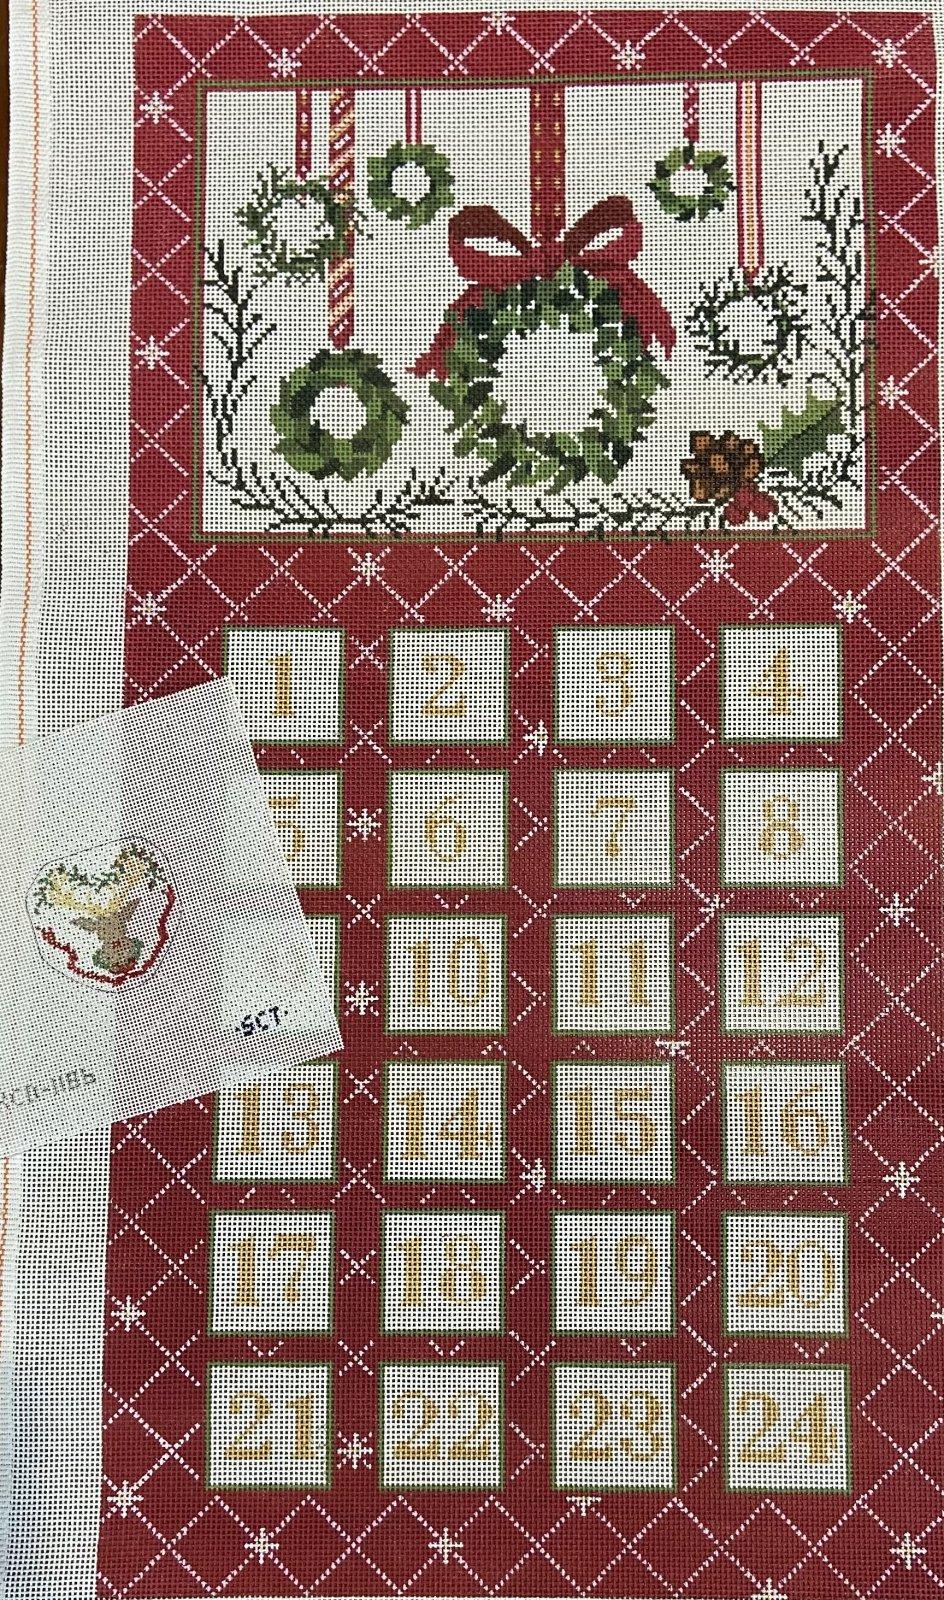 Advent Calendar w/Reindeer Ornament